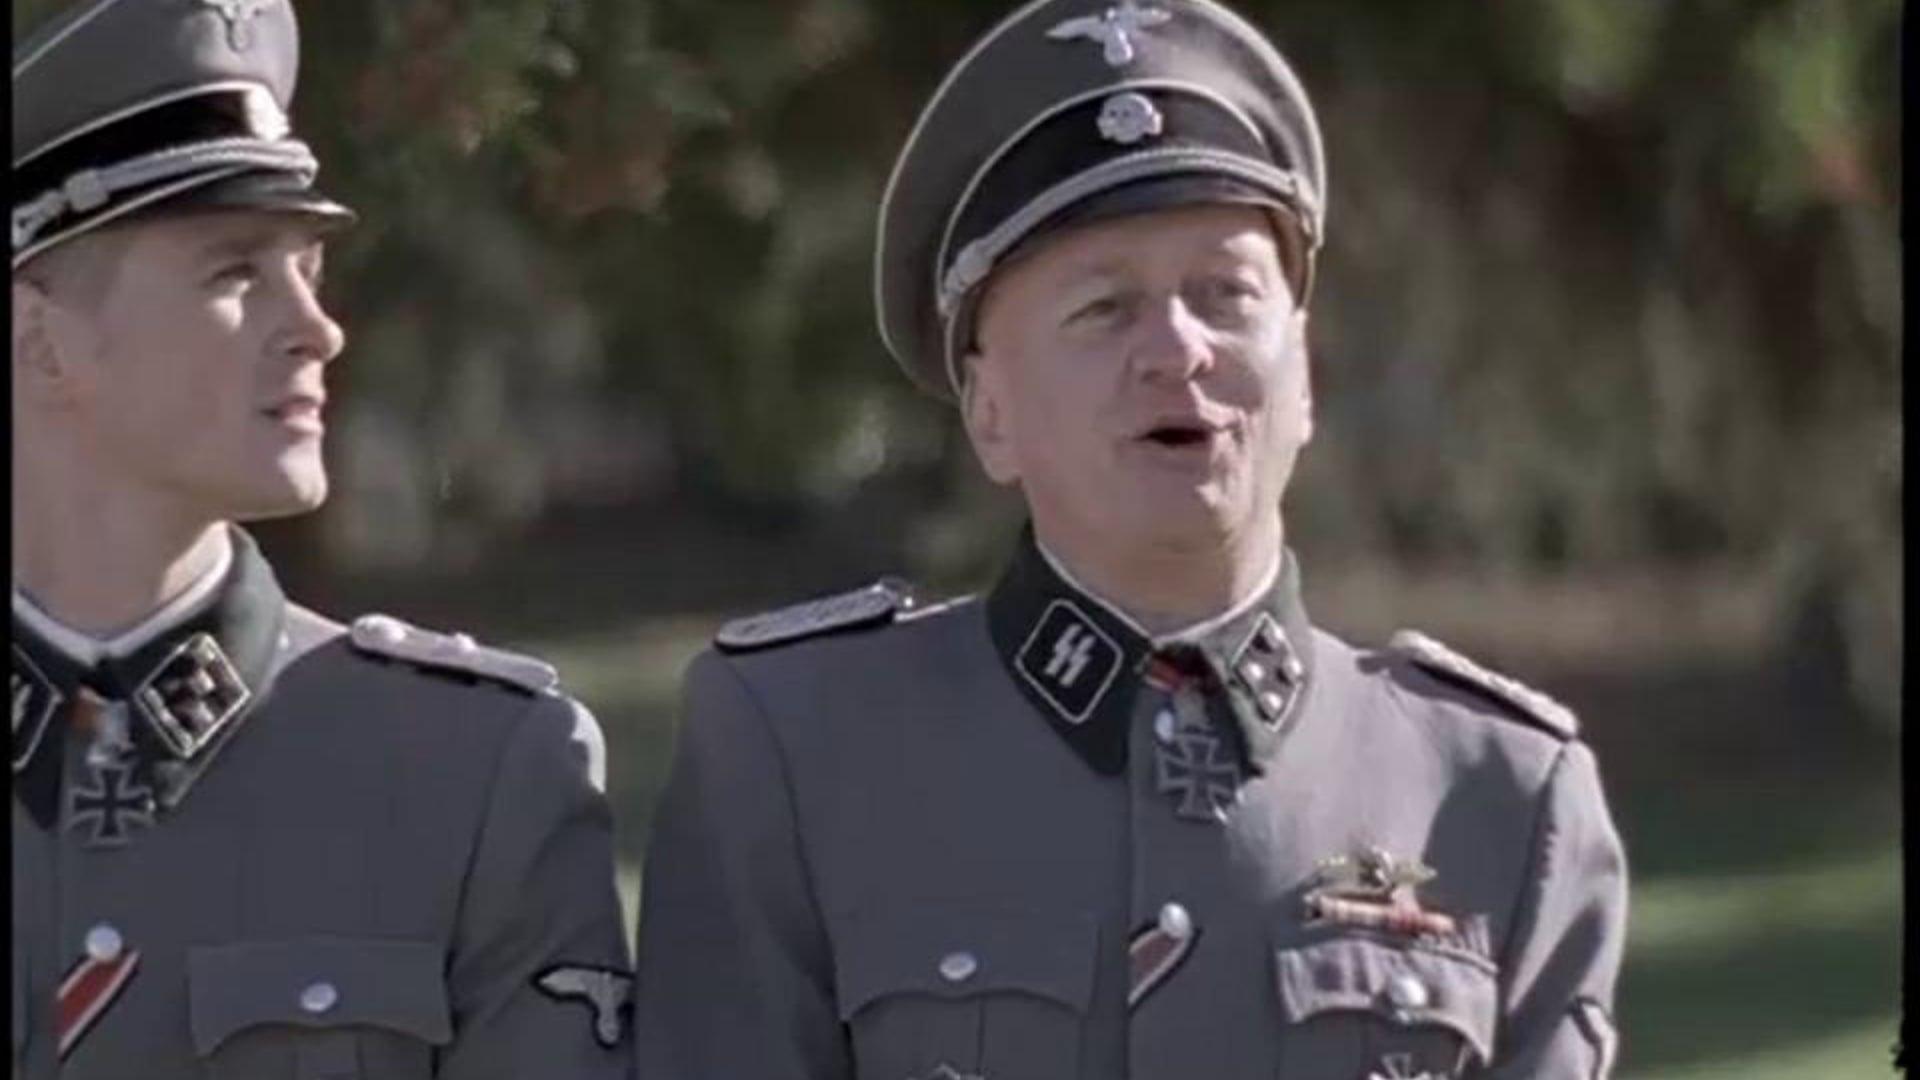 X-BOX 360 - Nazi Golf